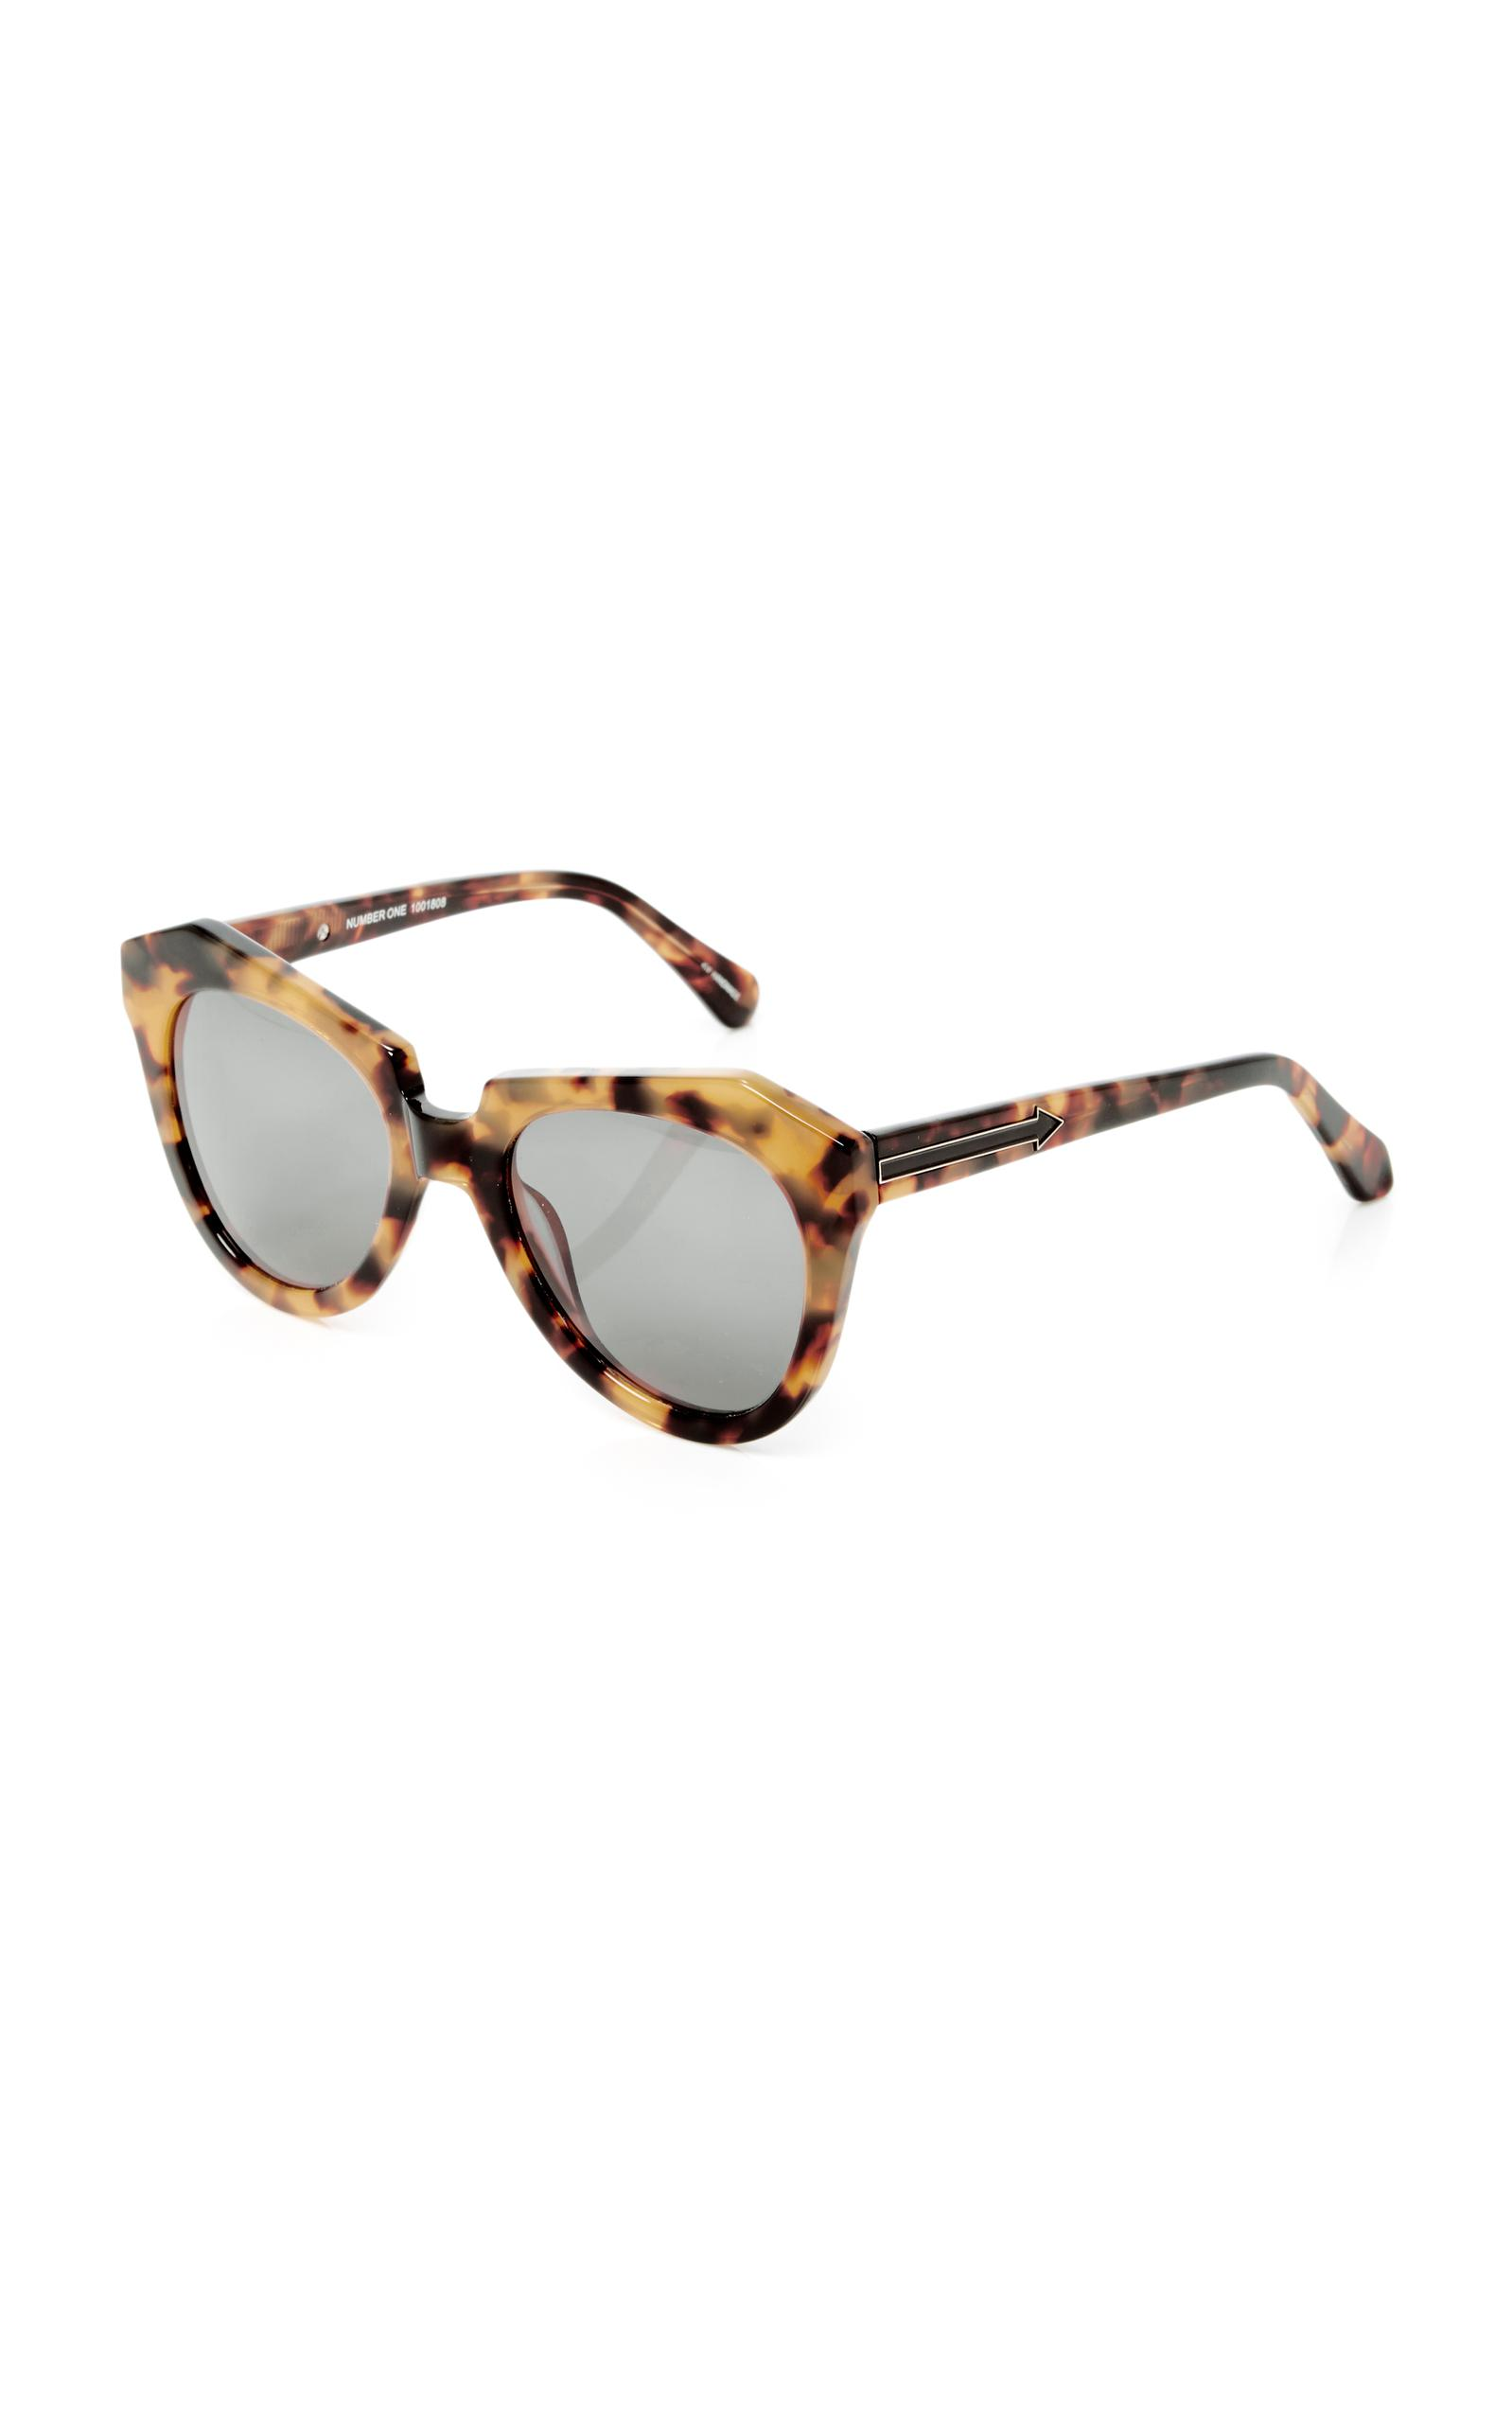 07b0cae60c0b ... Karen Walker Number One Tortoiseshell Acetate Sunglasses in Brown Lyst